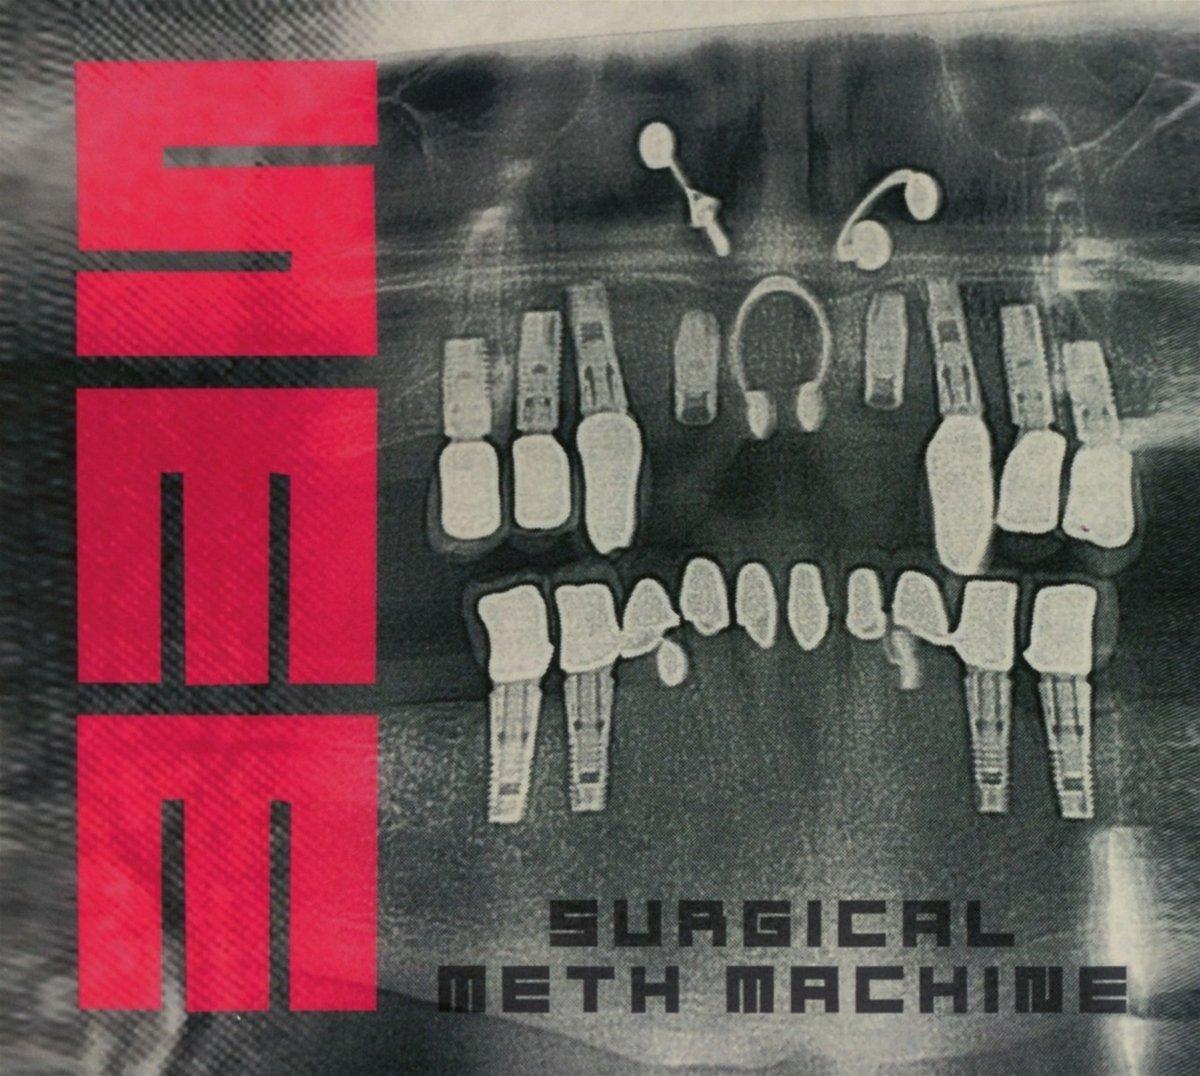 Surgical Meth Machine – Surgical Meth Machine